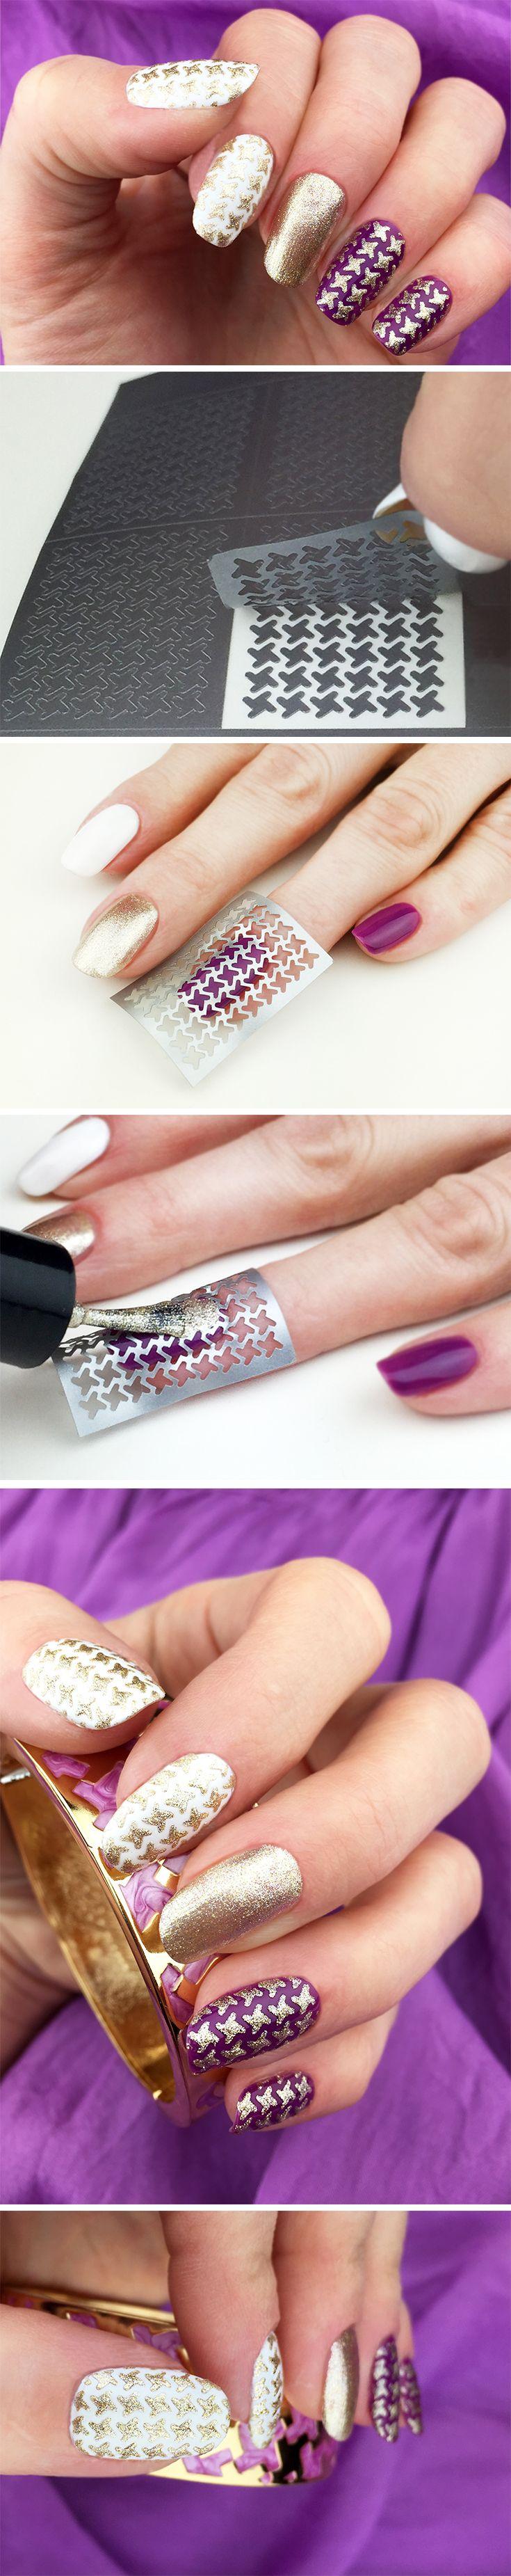 The 25+ best Nail art stencils ideas on Pinterest | Nail ...